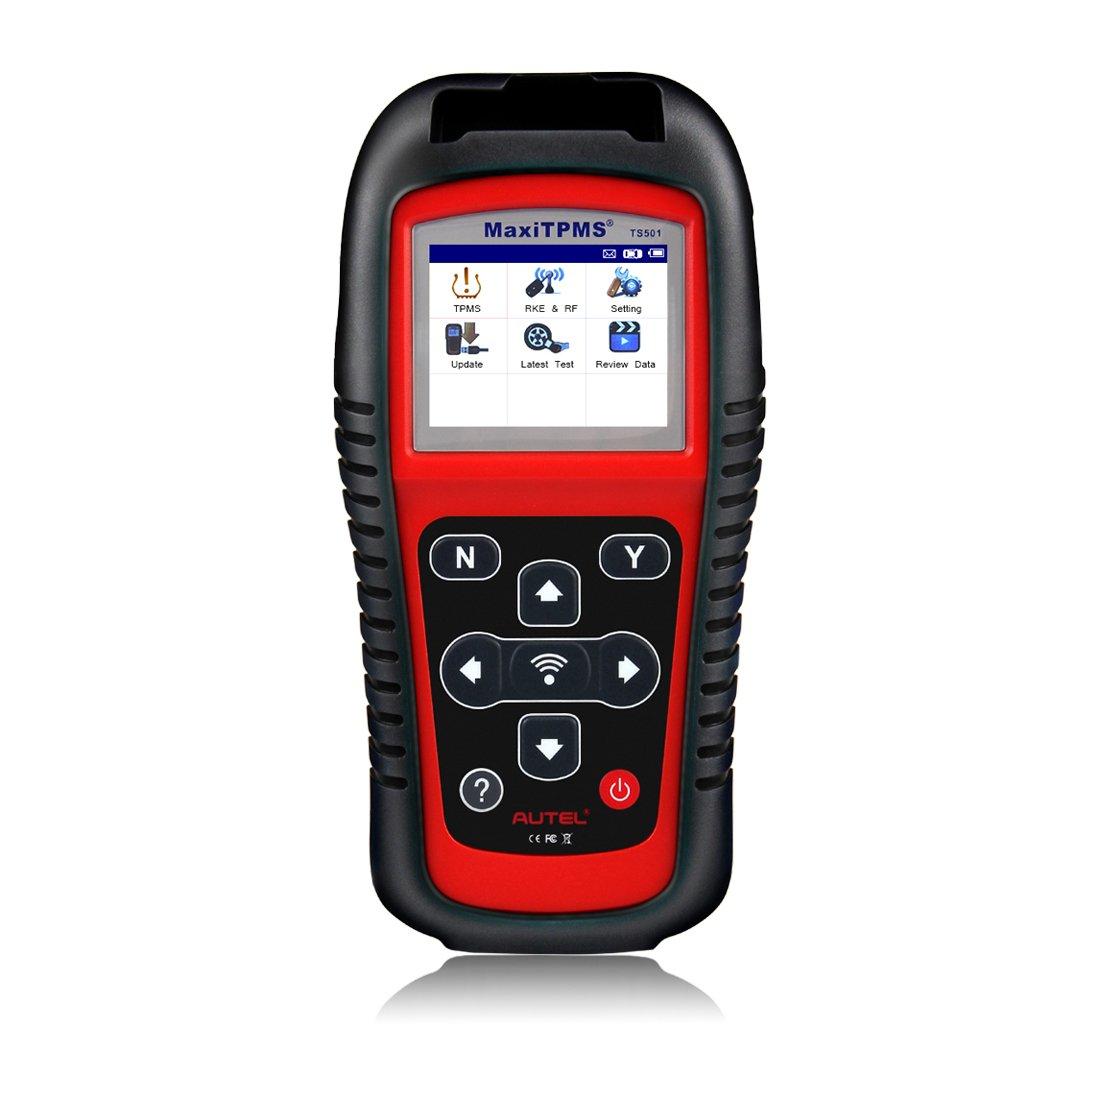 Autel MaxiTPMS TS501 TPMS OBD2 Activation Magnetic Tire Pressure Monitor  System Diagnostic Tool TPMS Sensor Check Kit ECU Program Reset Warning  Light